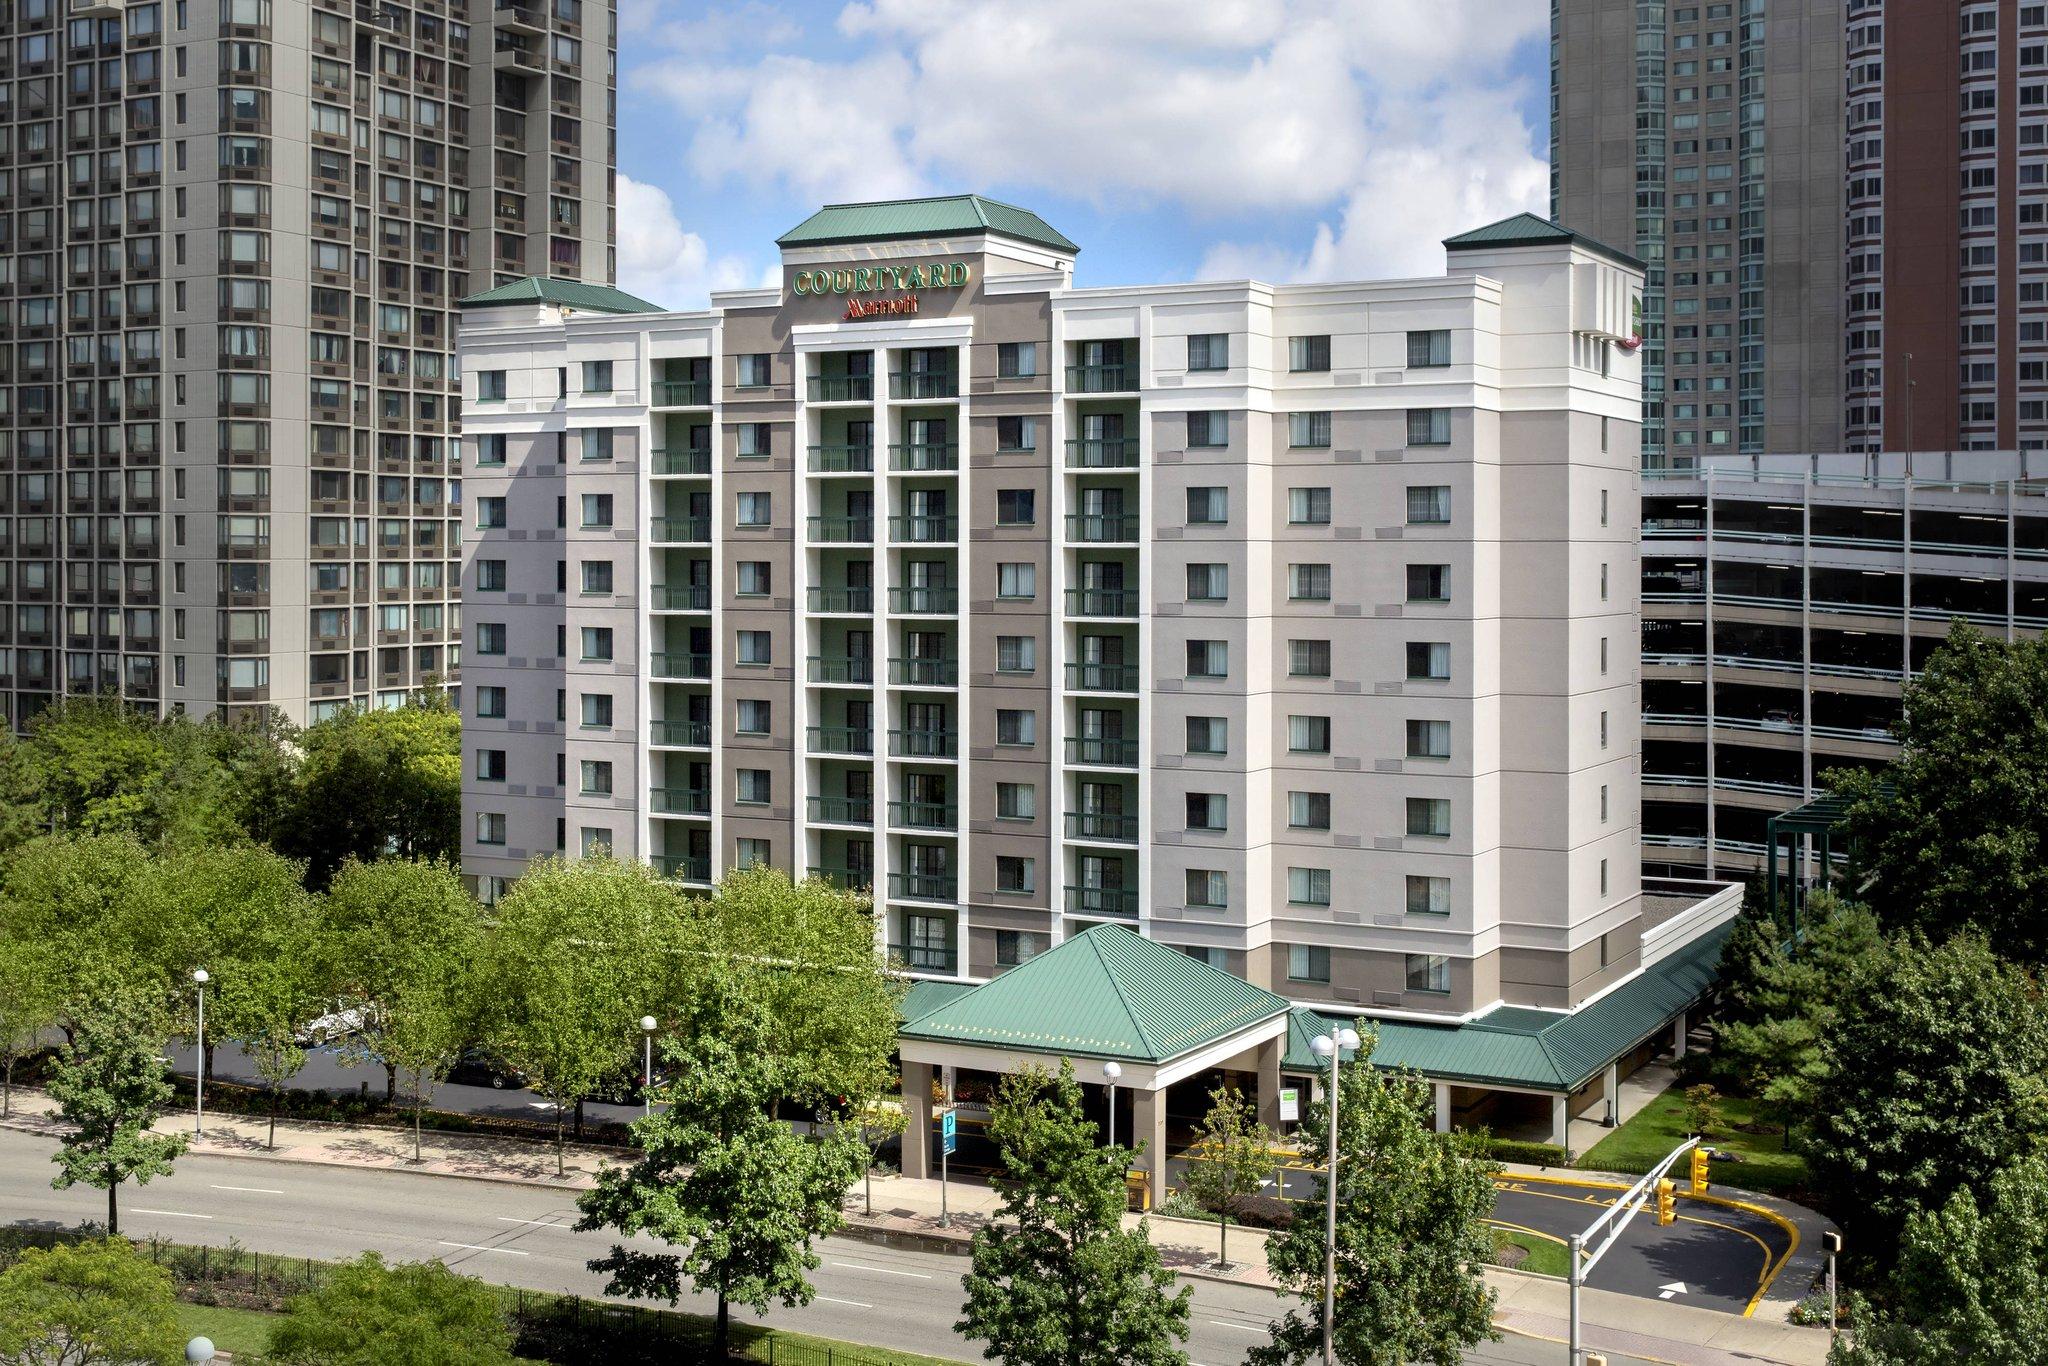 Courtyard Marriott Jersey City Newport